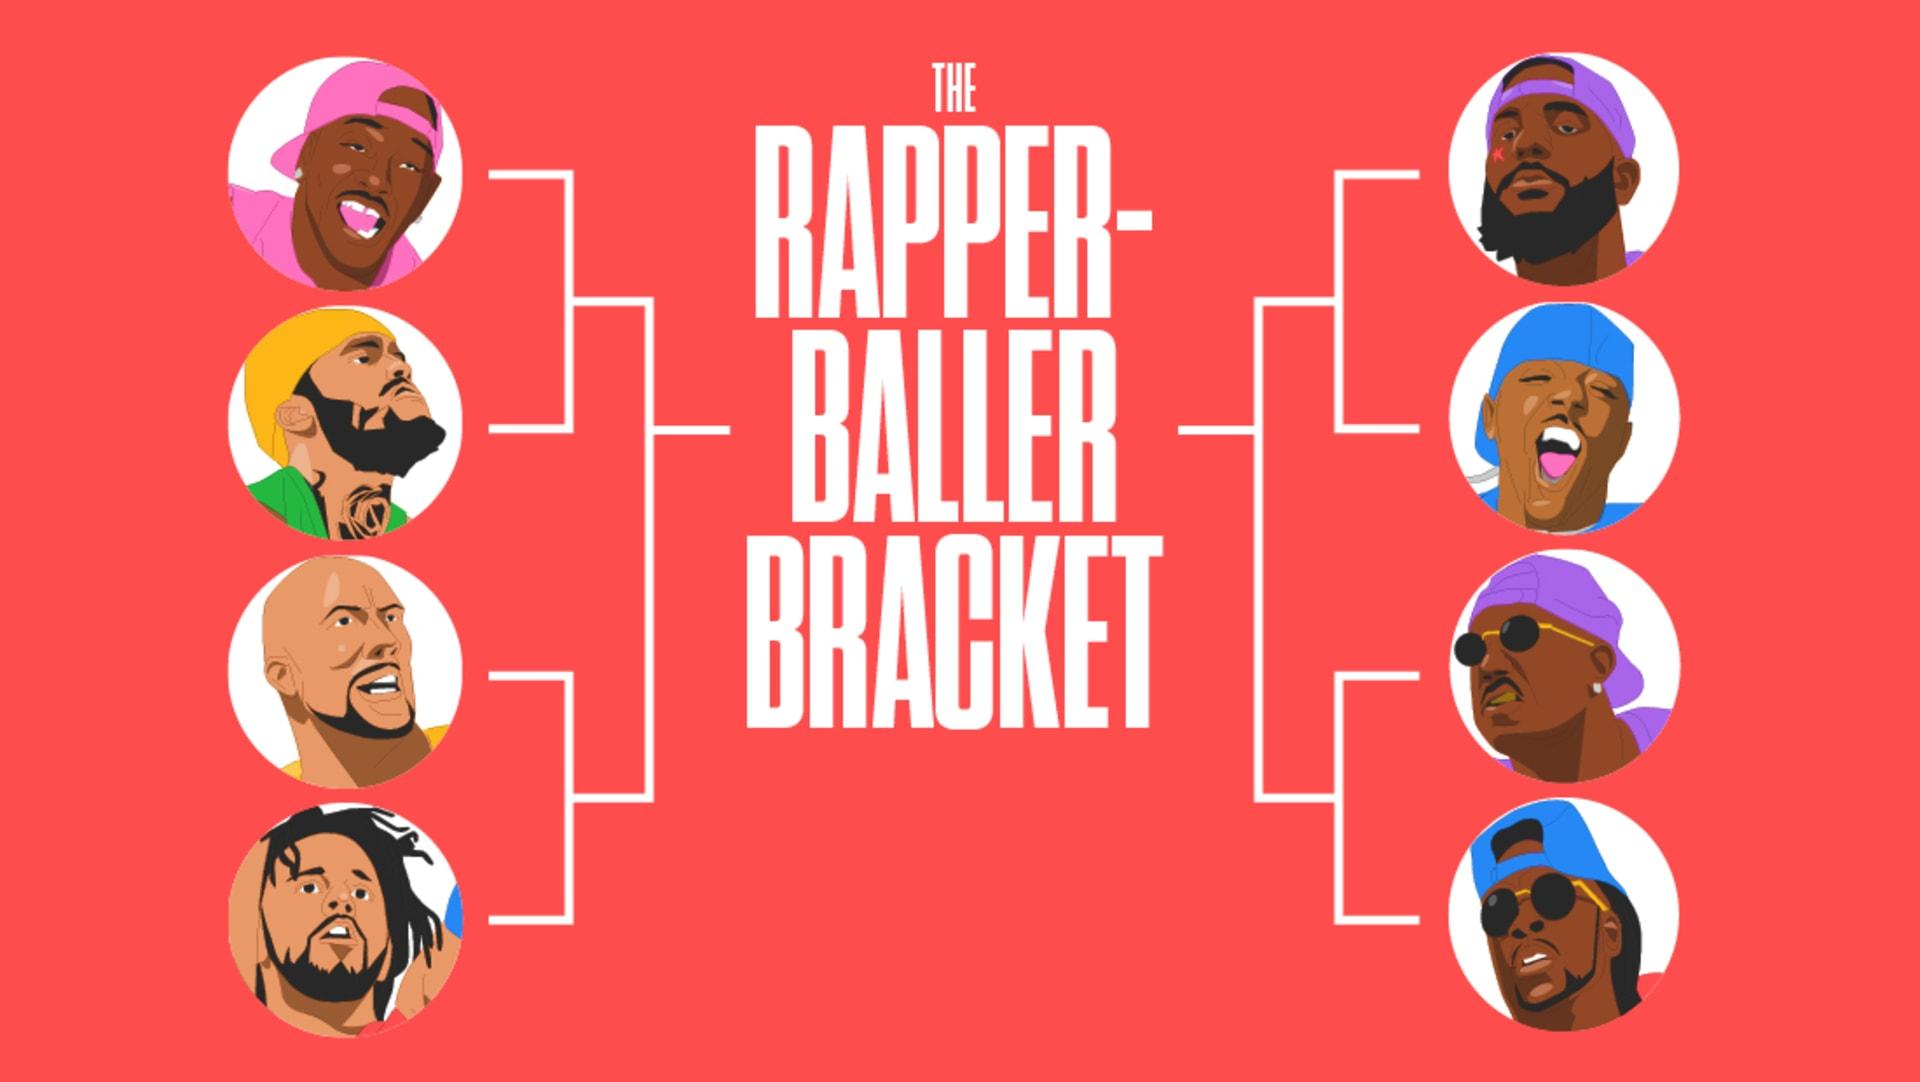 Rapper-Baller Bracket Elite 8 Lead Image